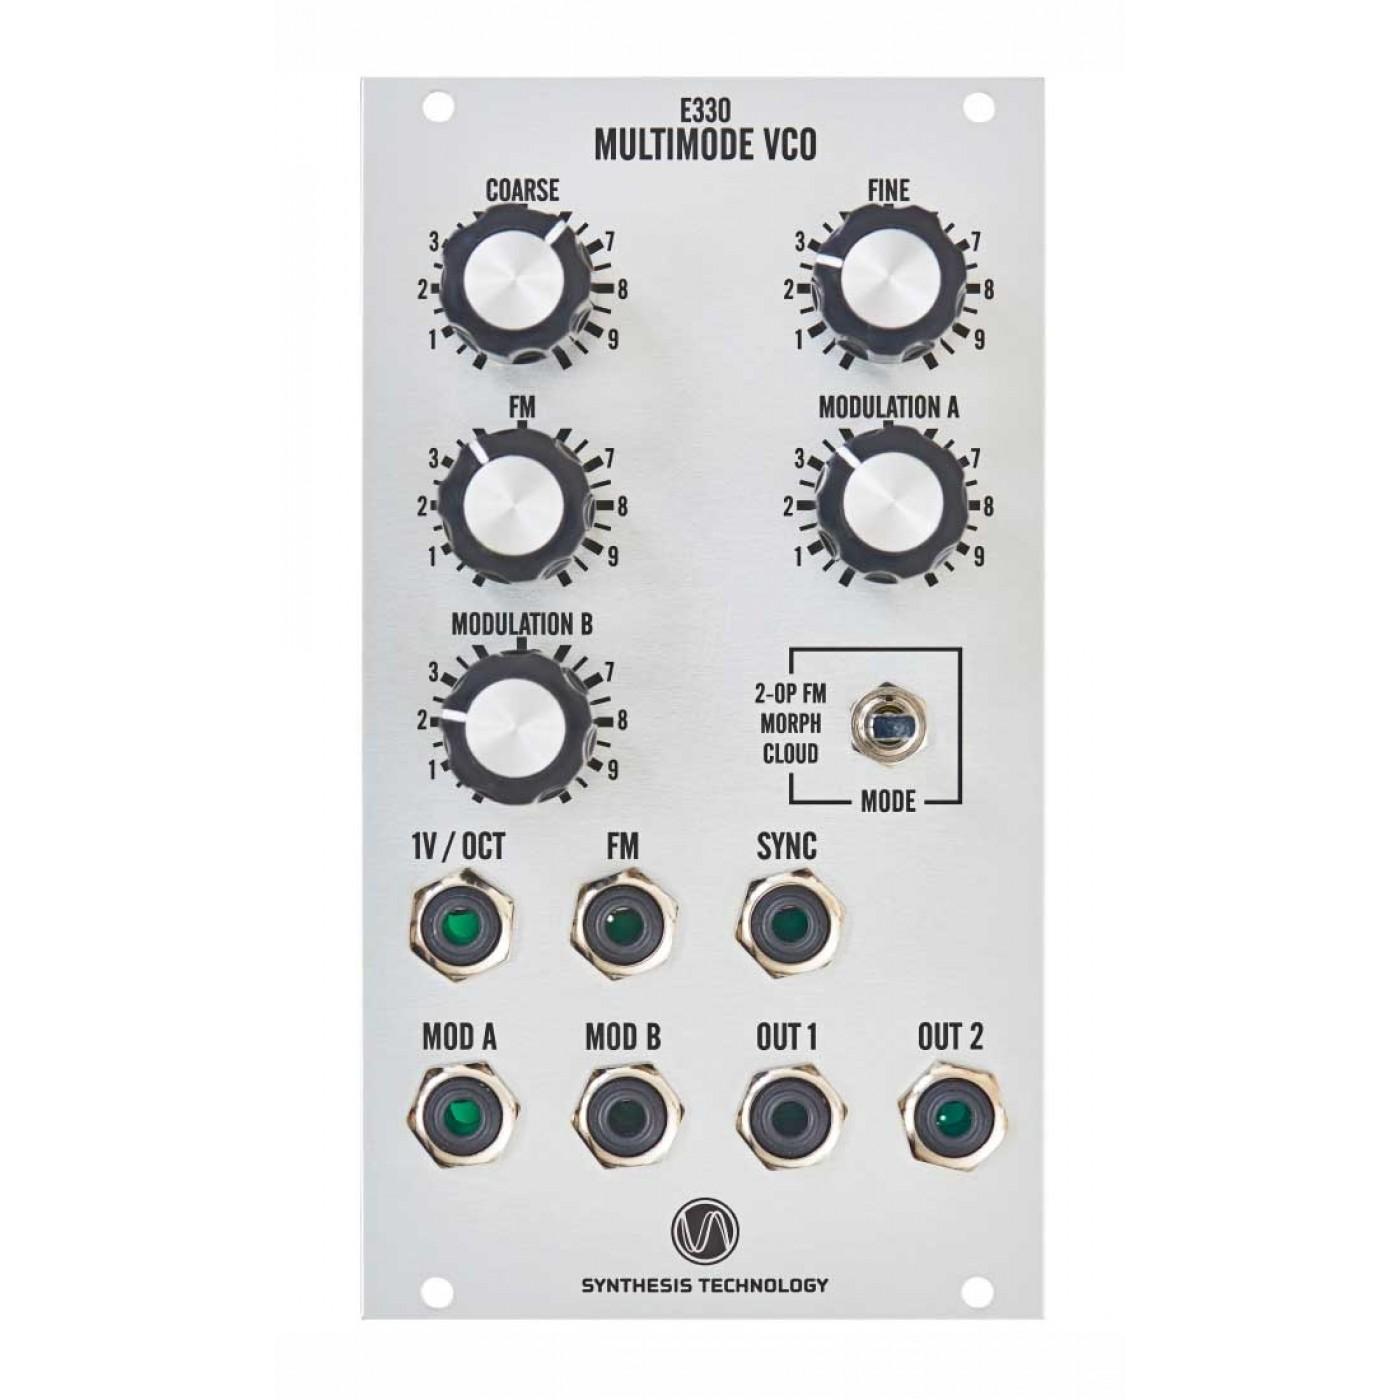 Synthesis Technology E330 Multi VCO